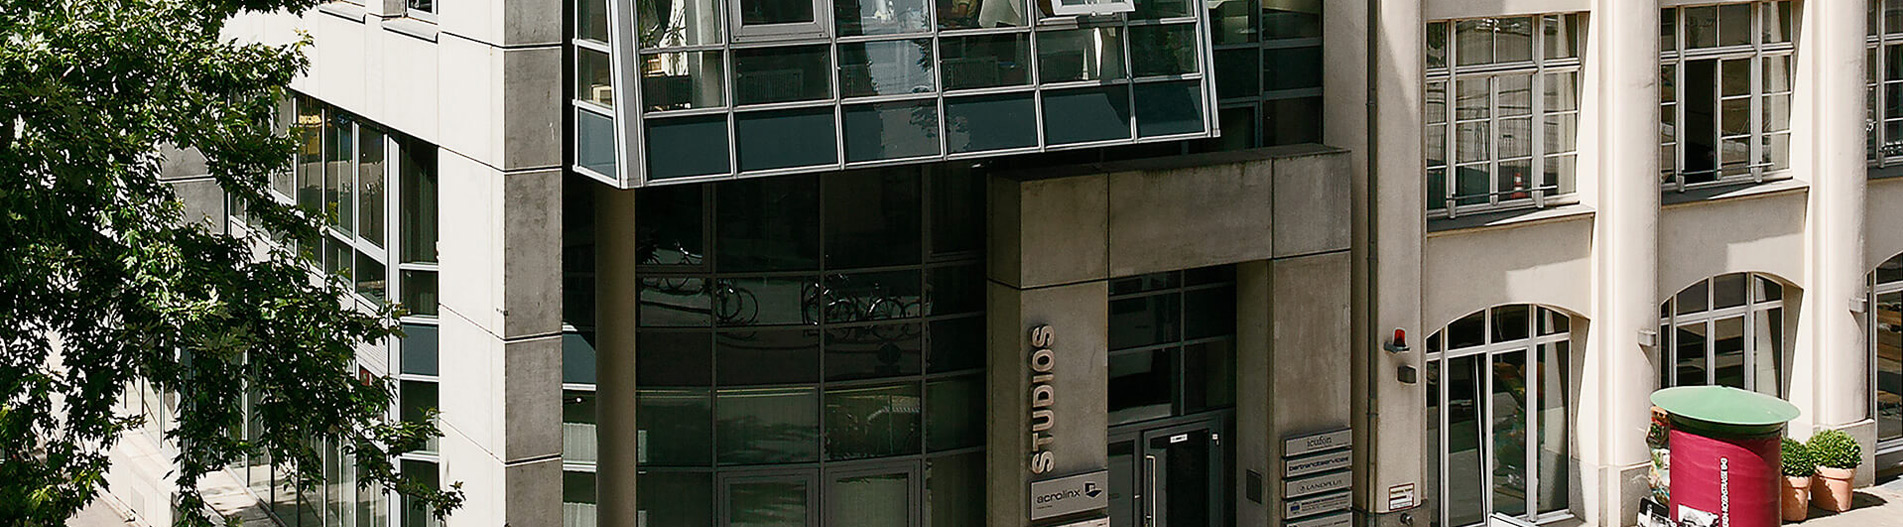 Business Center Berlin Mitte office rentals